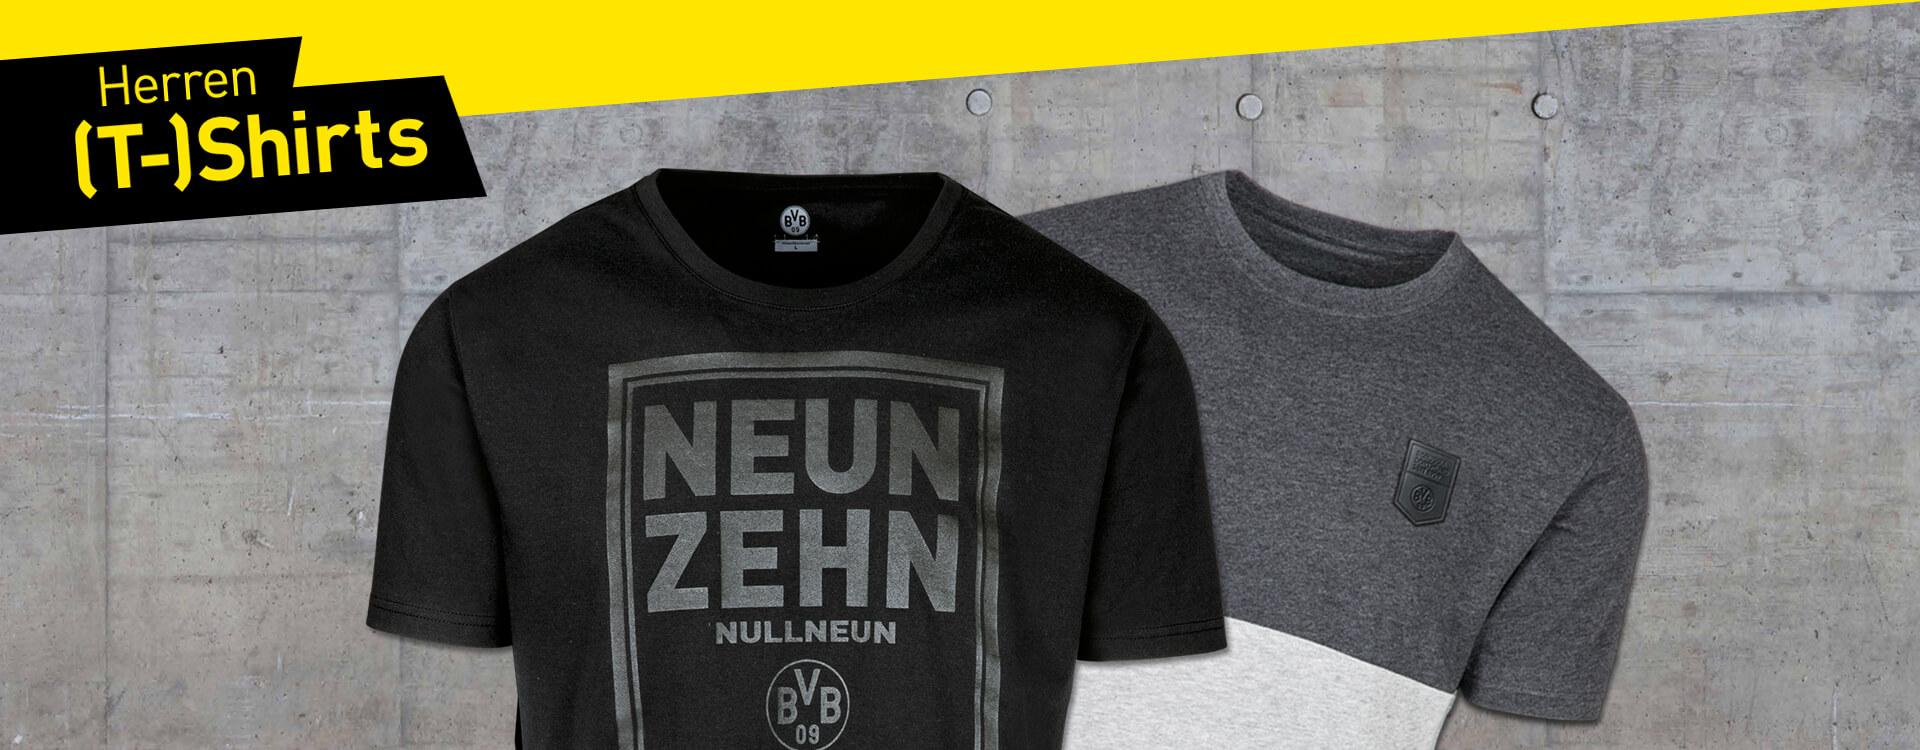 B2C_Kategorie_DT_1920x750_herren_shirts